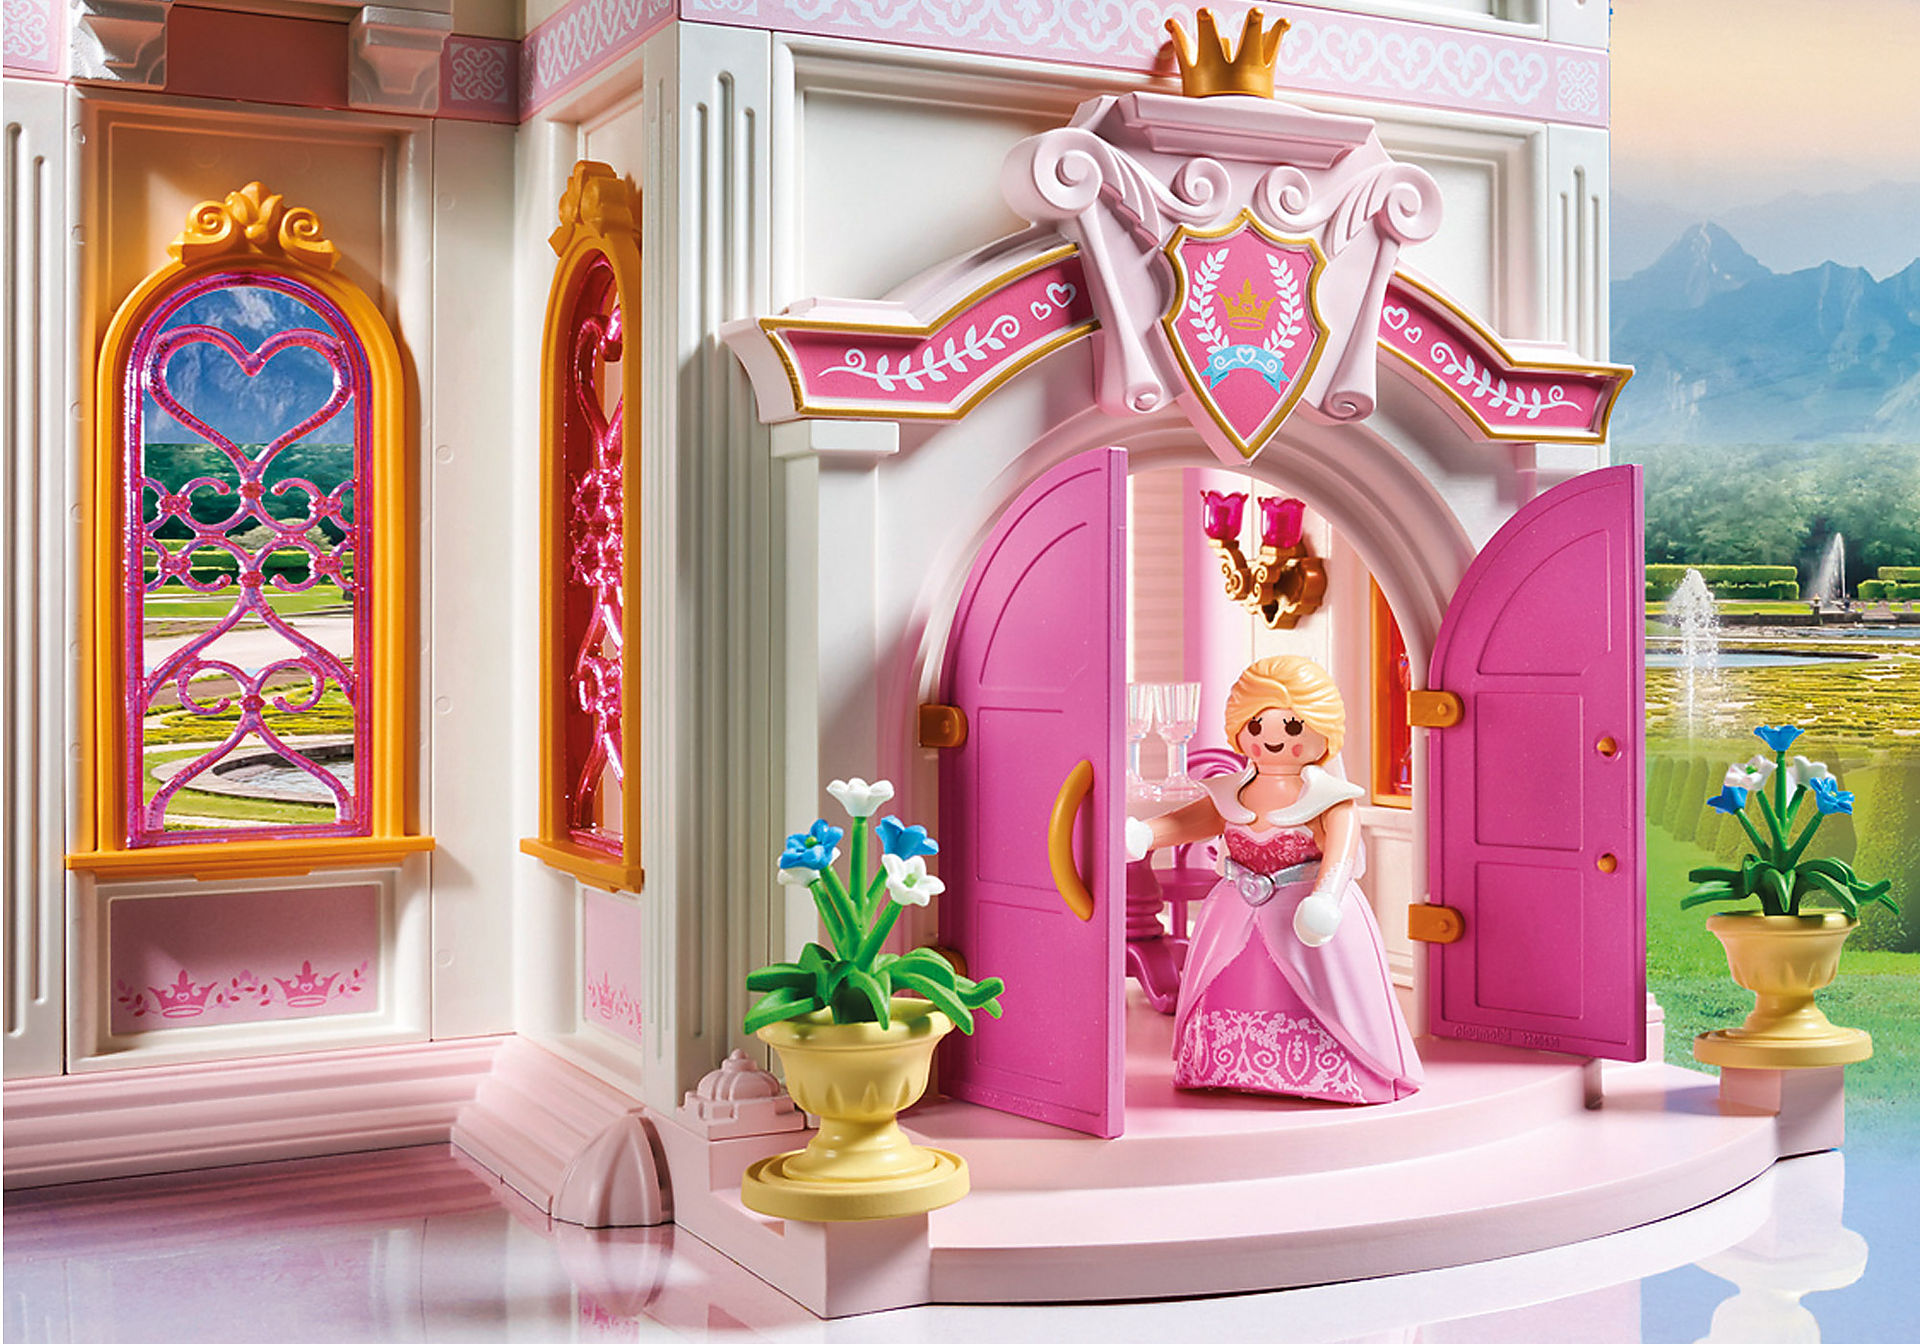 70447 Grande Castelo das Princesas zoom image5